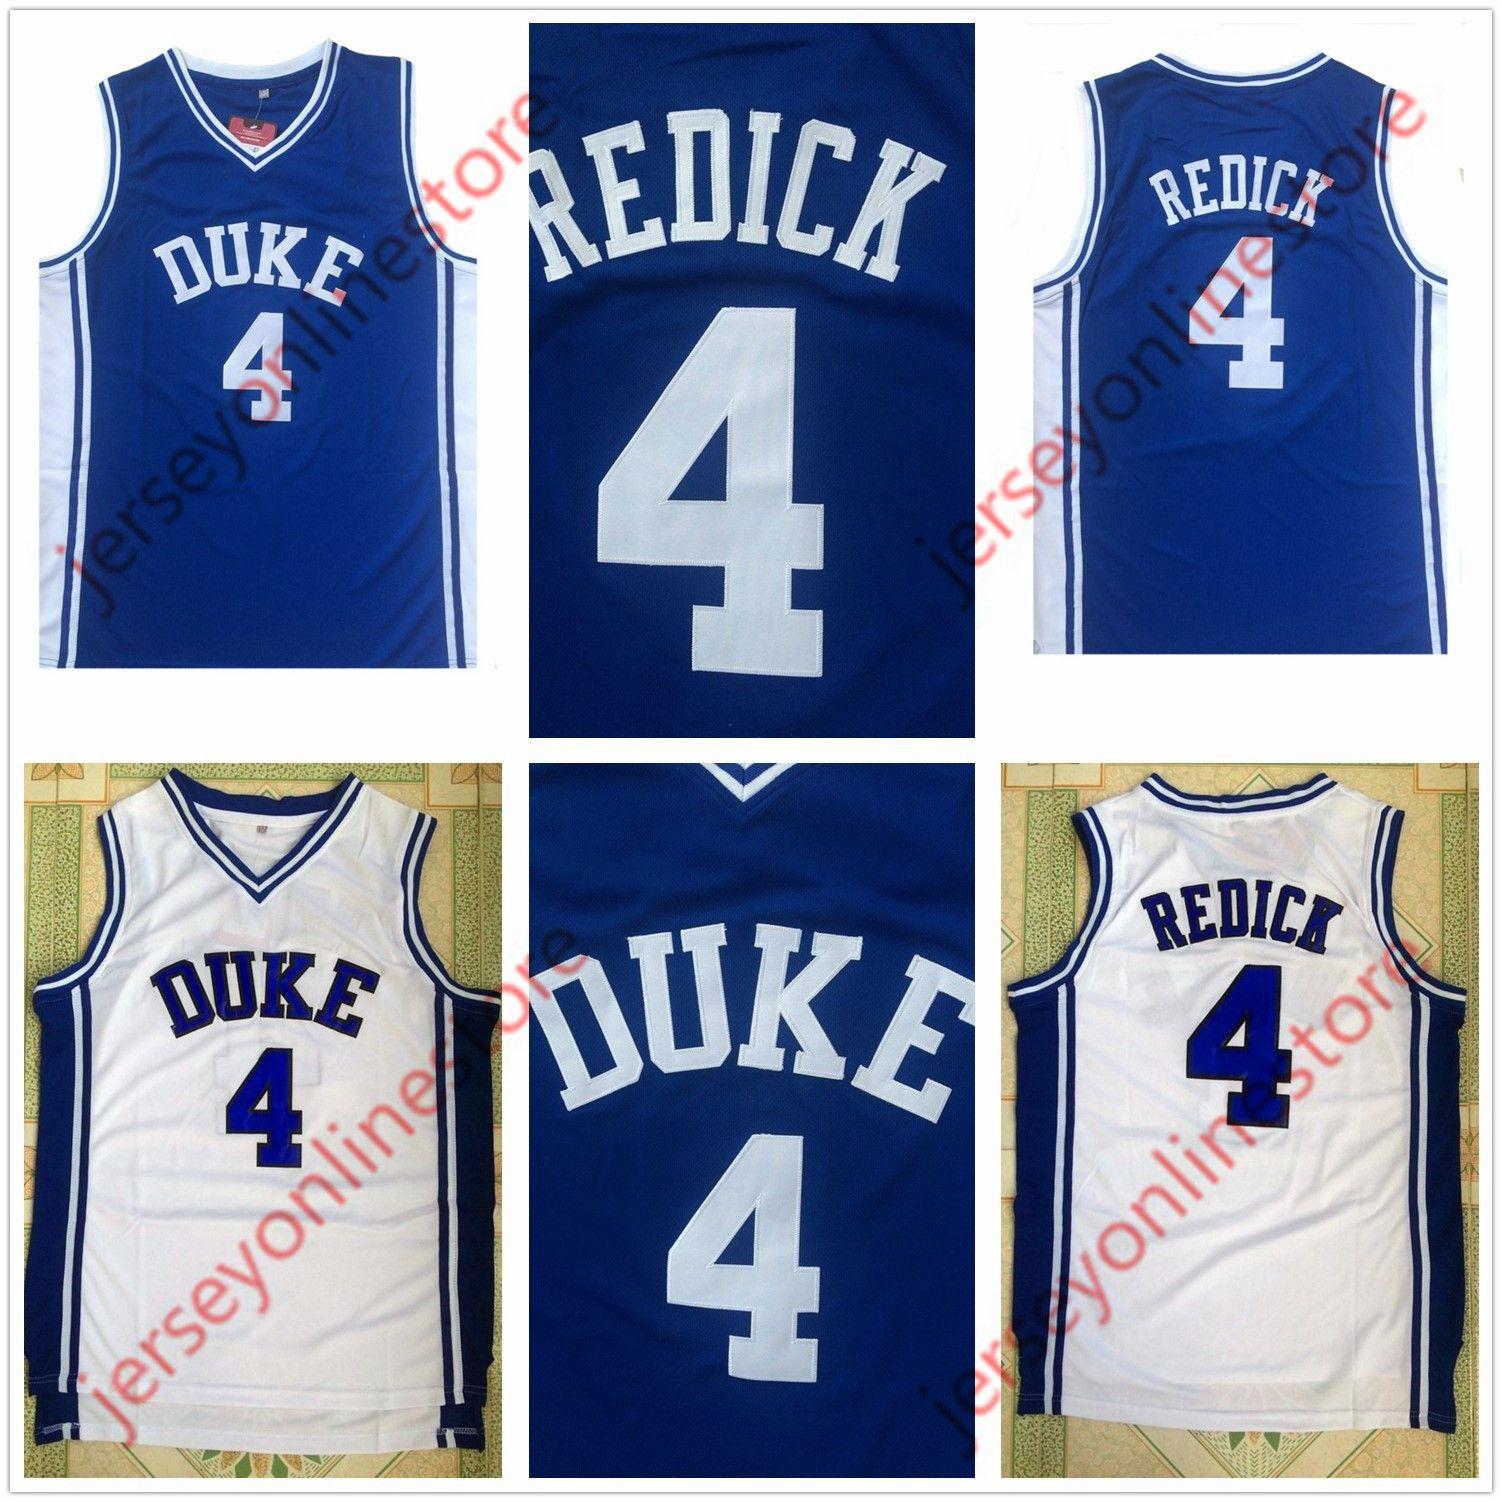 04513676faed ... where can i buy cheap mens duke blue devils 4 jj redick jersey 30014  0584e